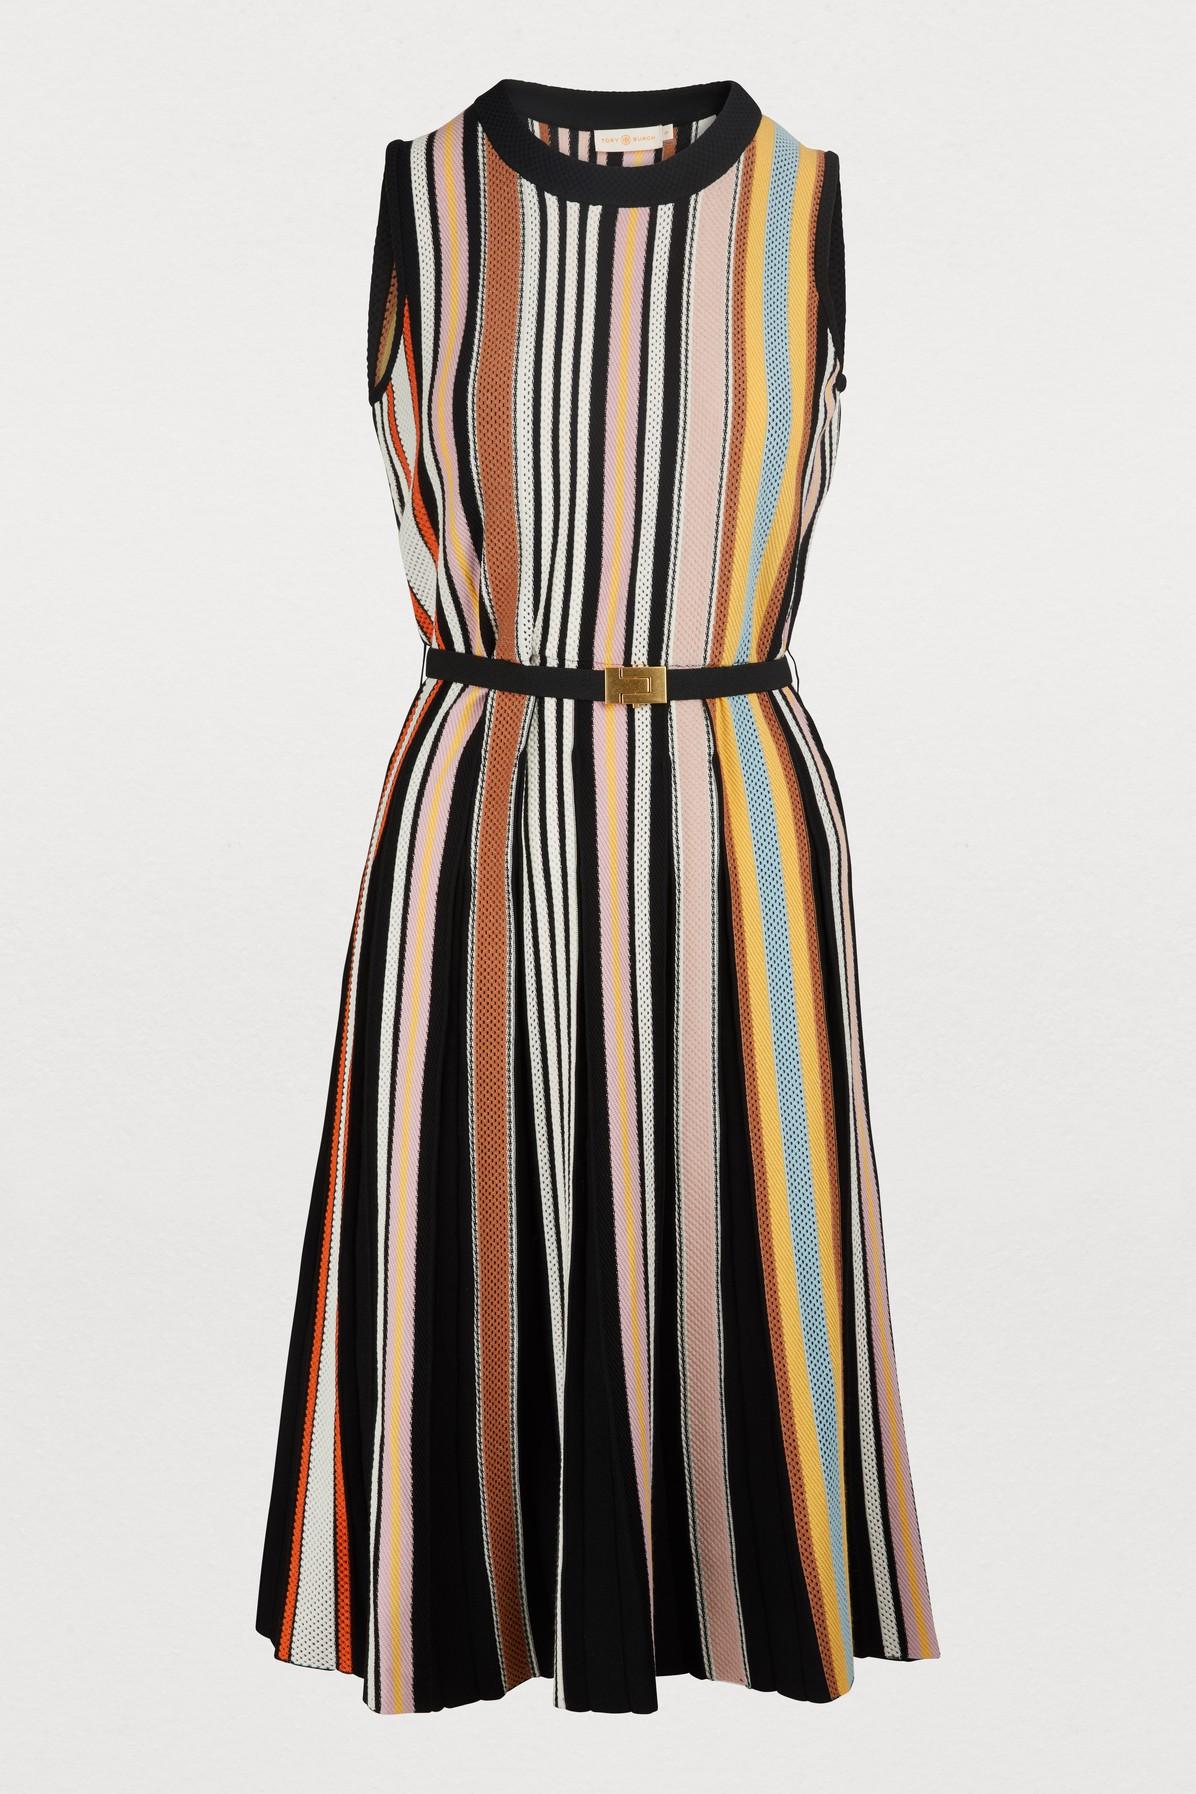 86f4db5f20e Tory Burch Striped Sleeveless Sweaterdress In Webbing Stripe